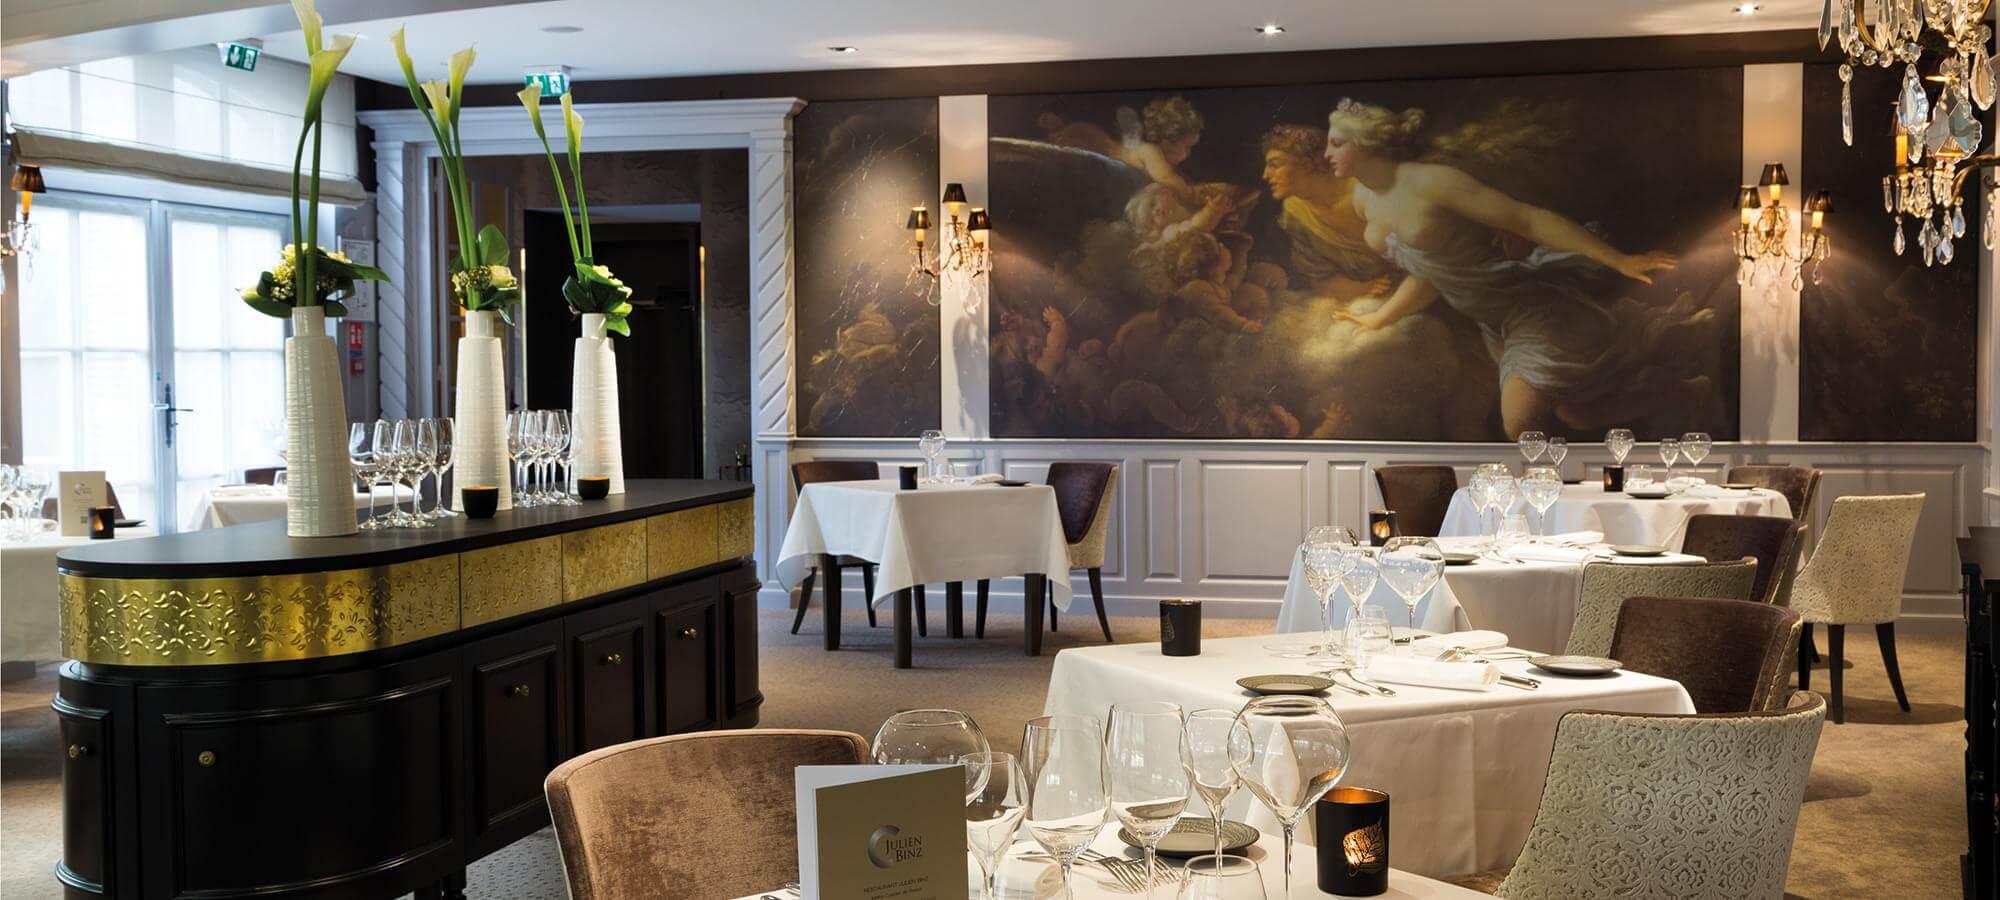 Restaurant Julien Binz